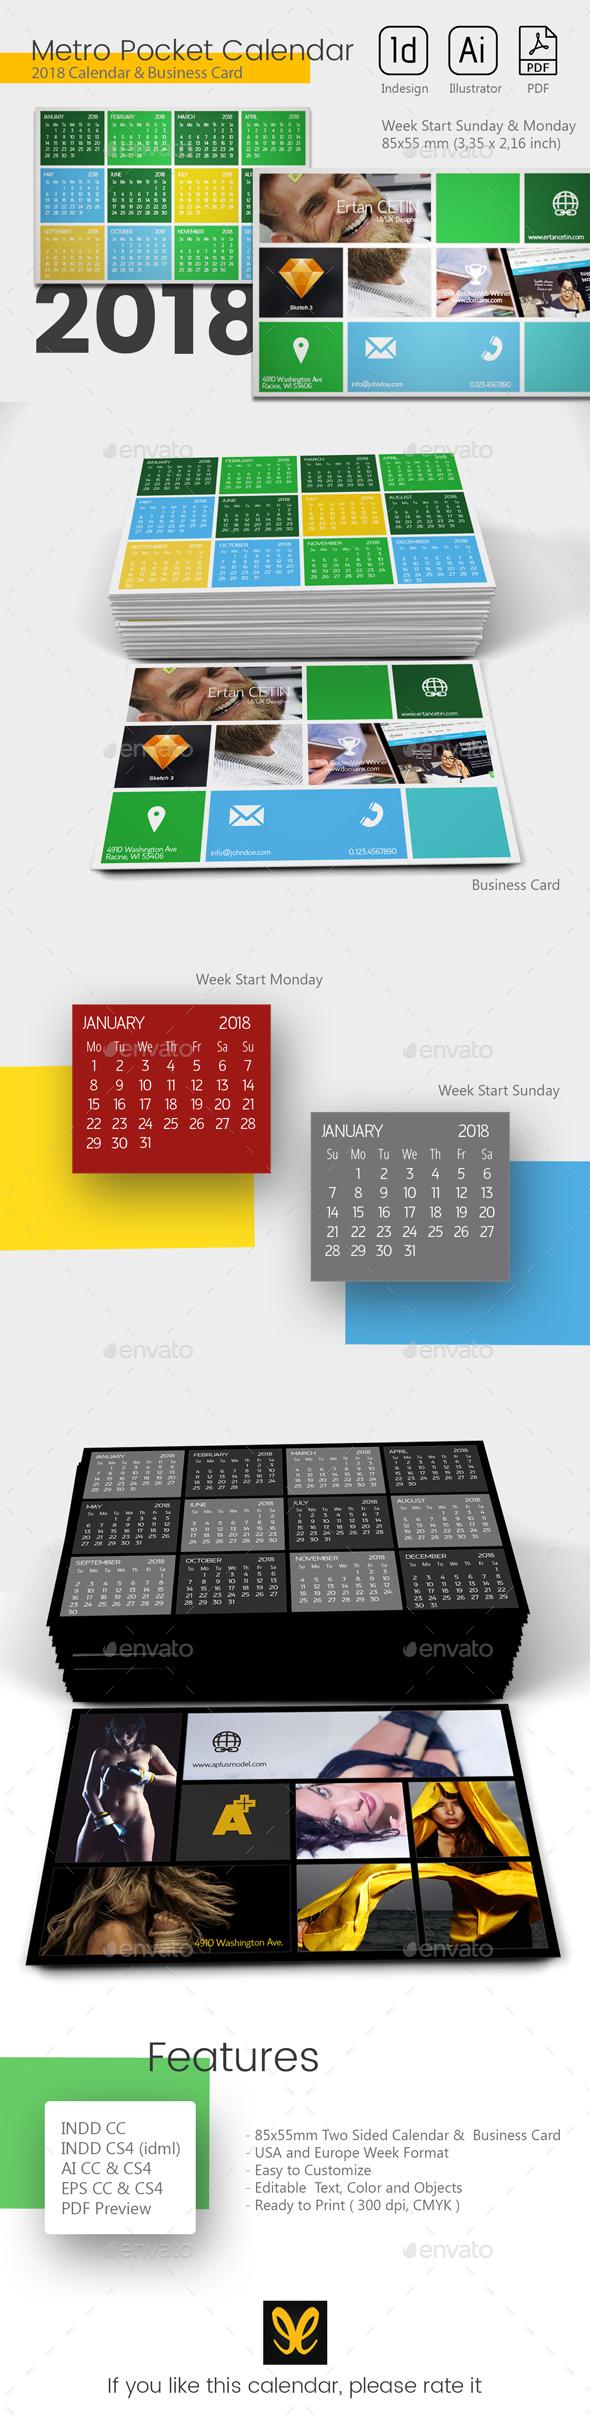 Pocket Calendar 2018 - Metro Style - Calendars Stationery